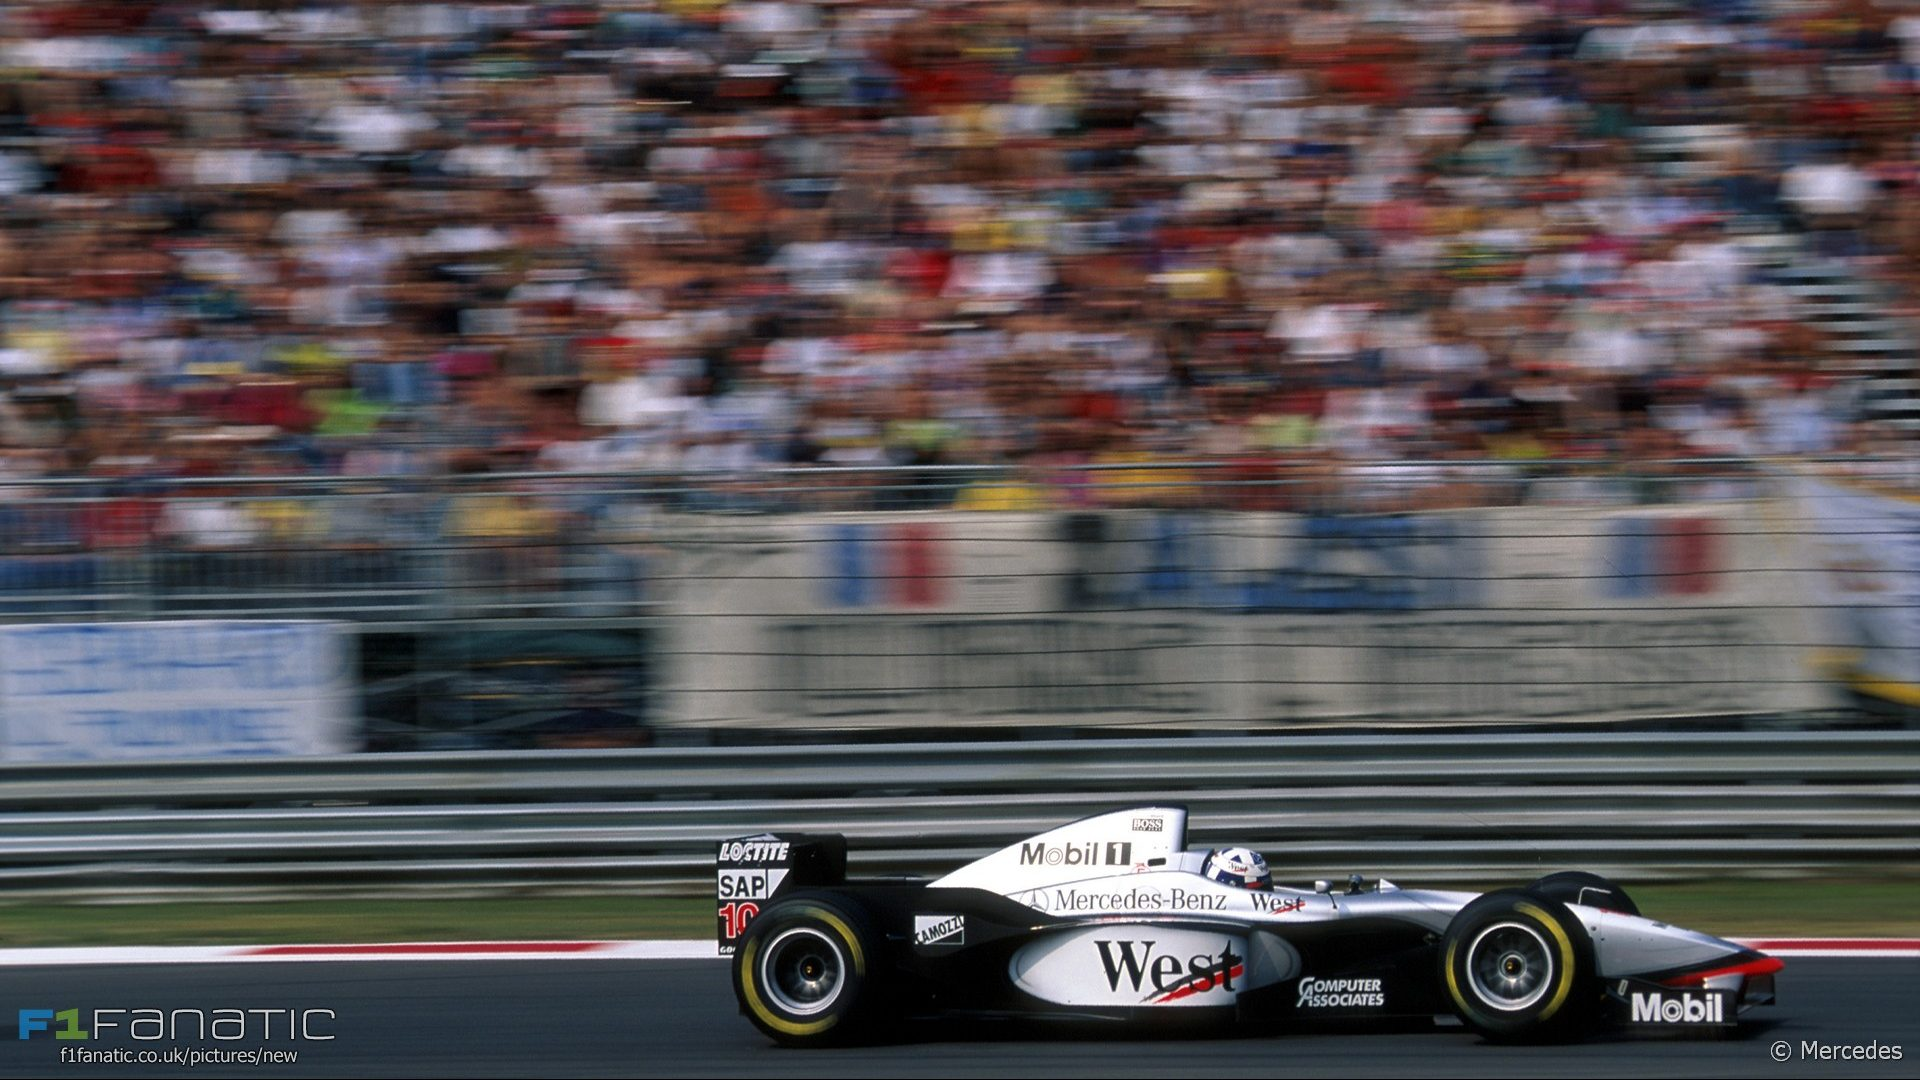 David Coulthard, McLaren-Monza, 1997